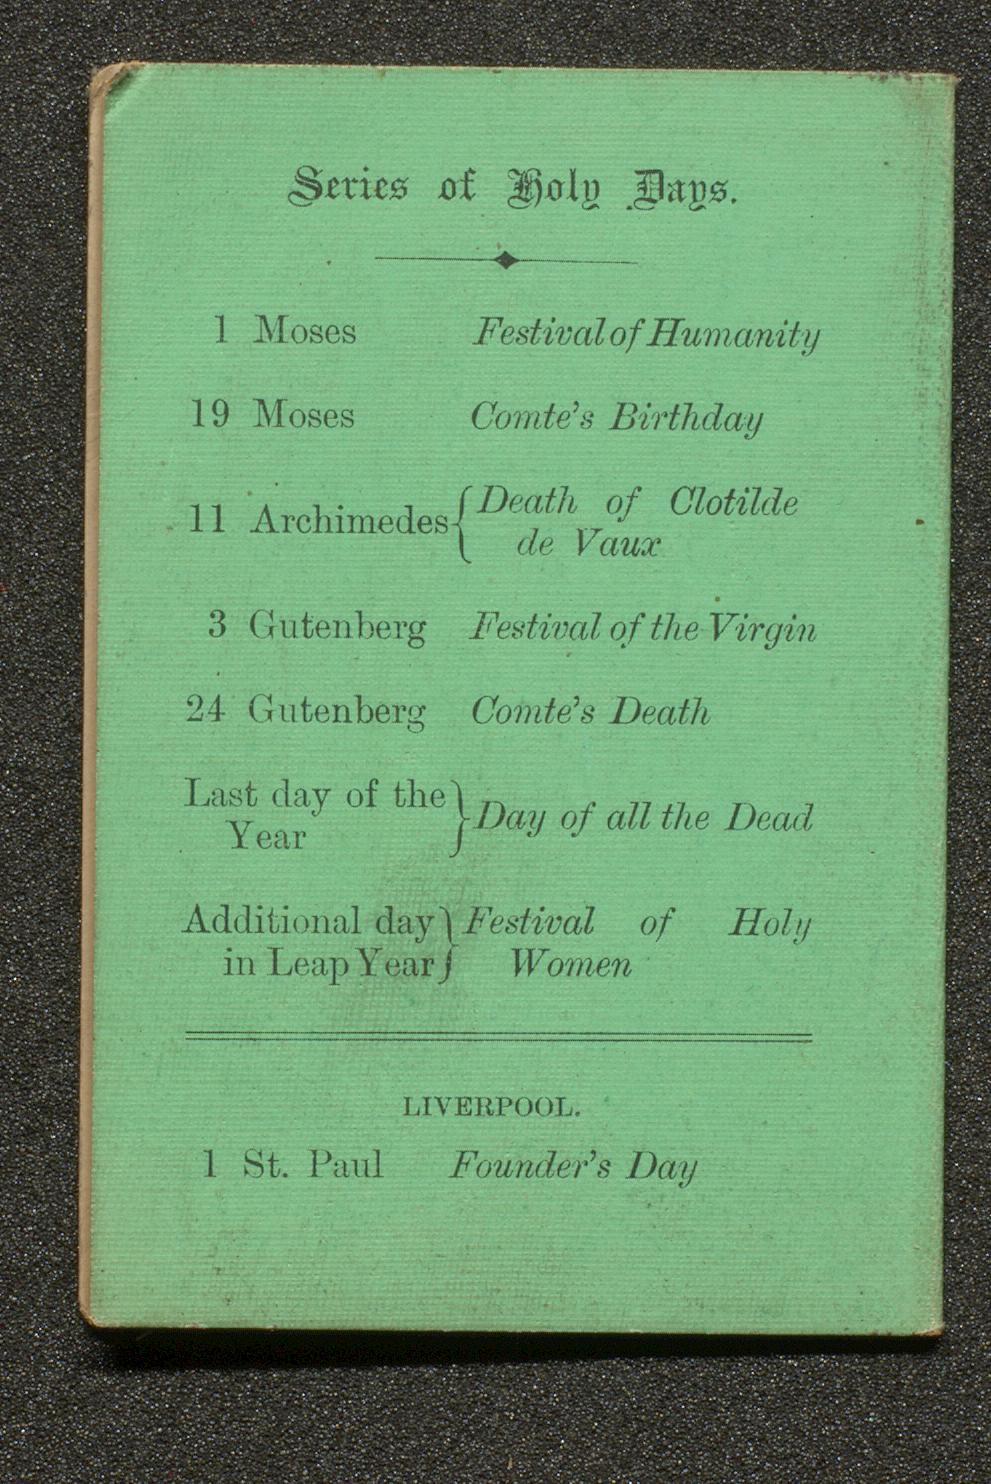 back cover of civil and positivist calendar